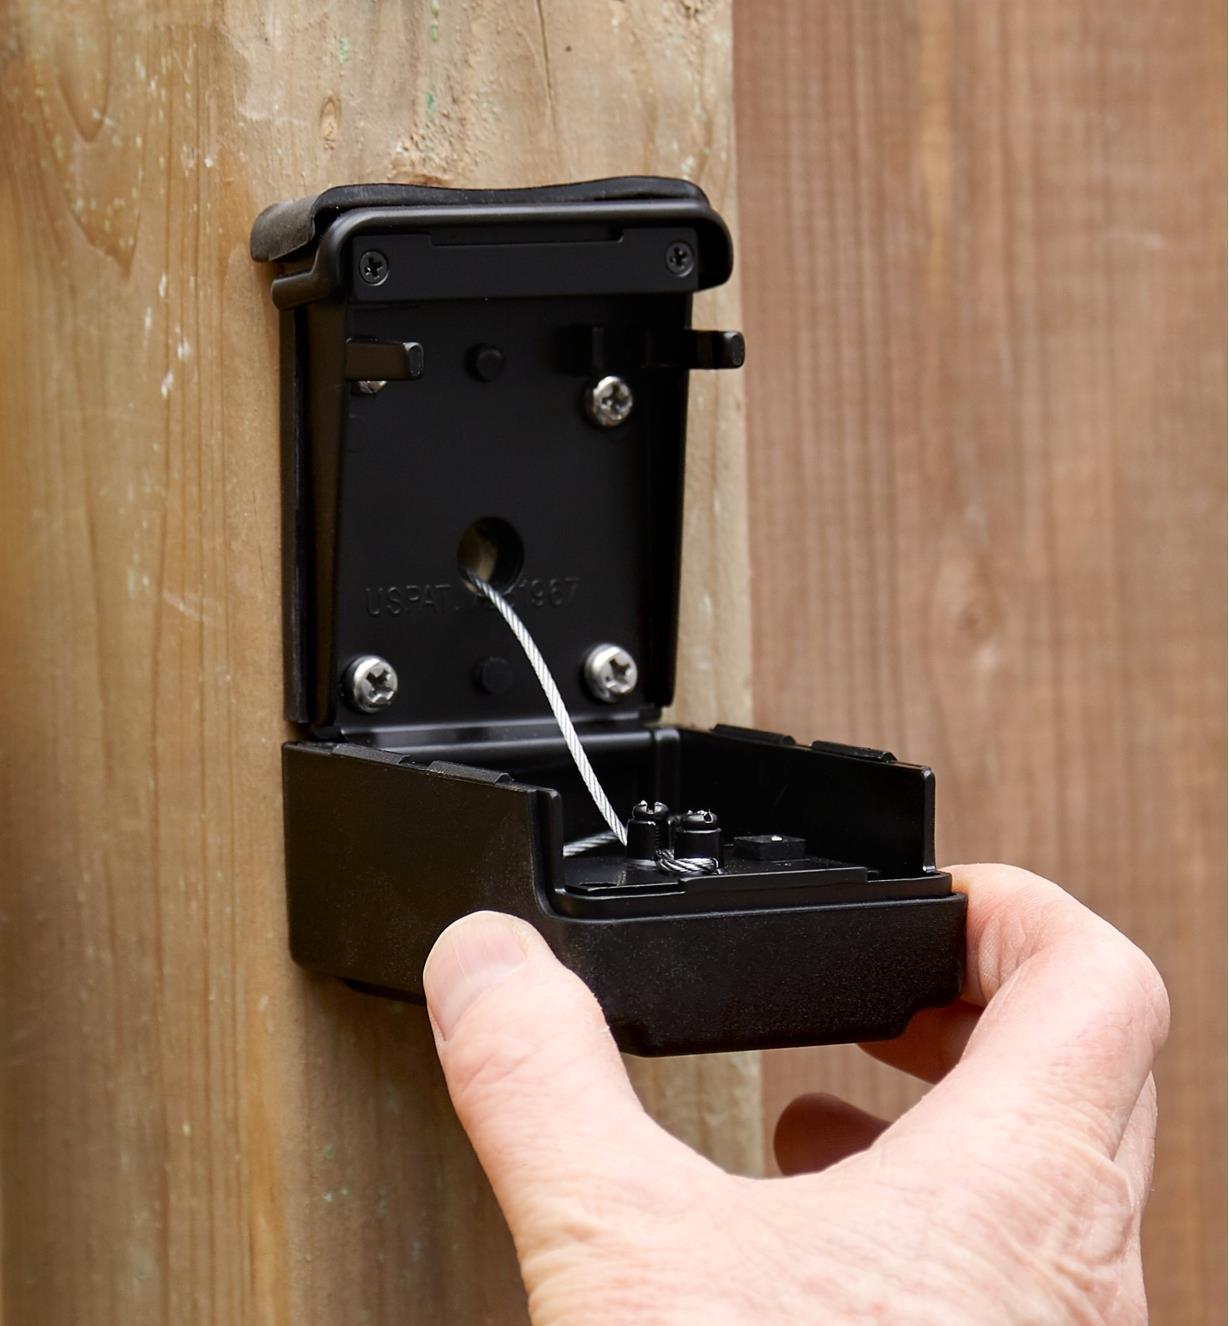 Opening the keyless gate lock